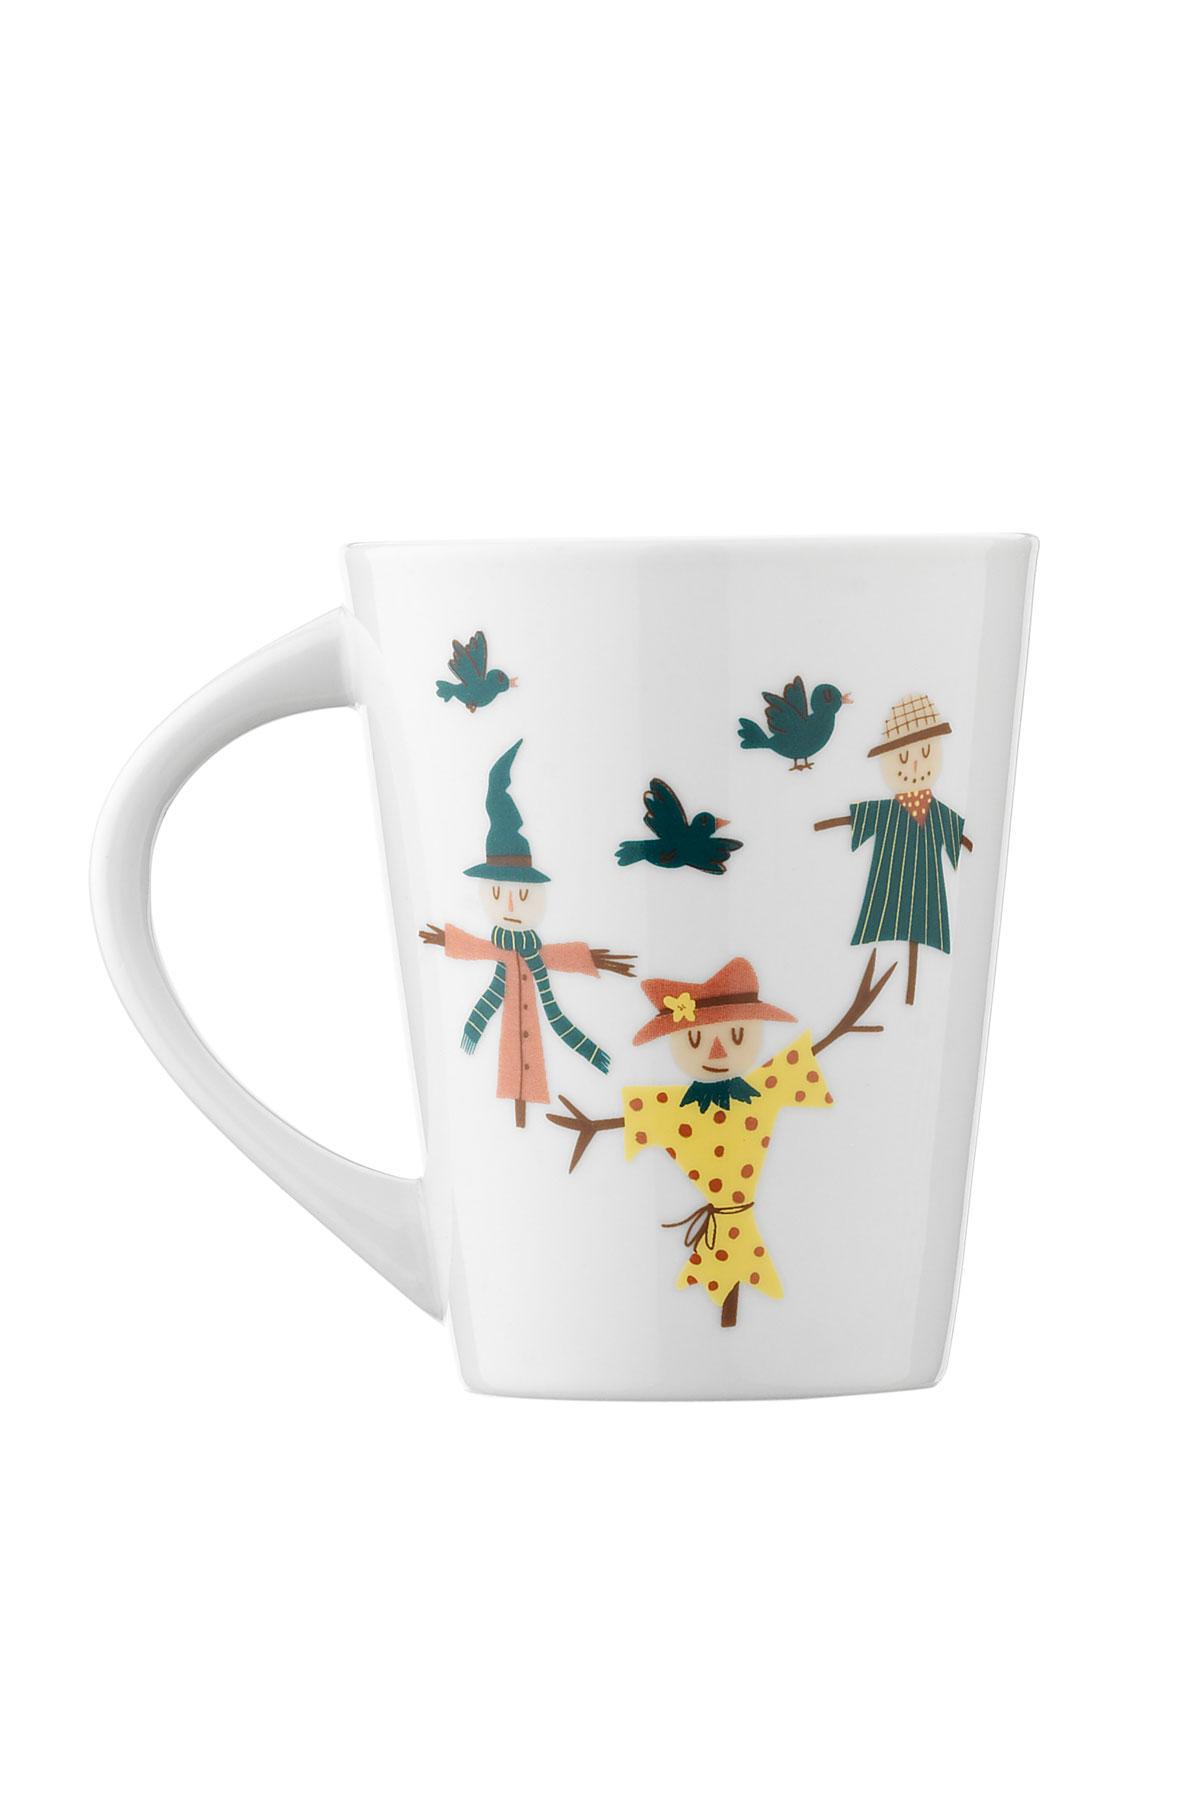 Kütahya Porselen 10945 Desen Mug Bardak